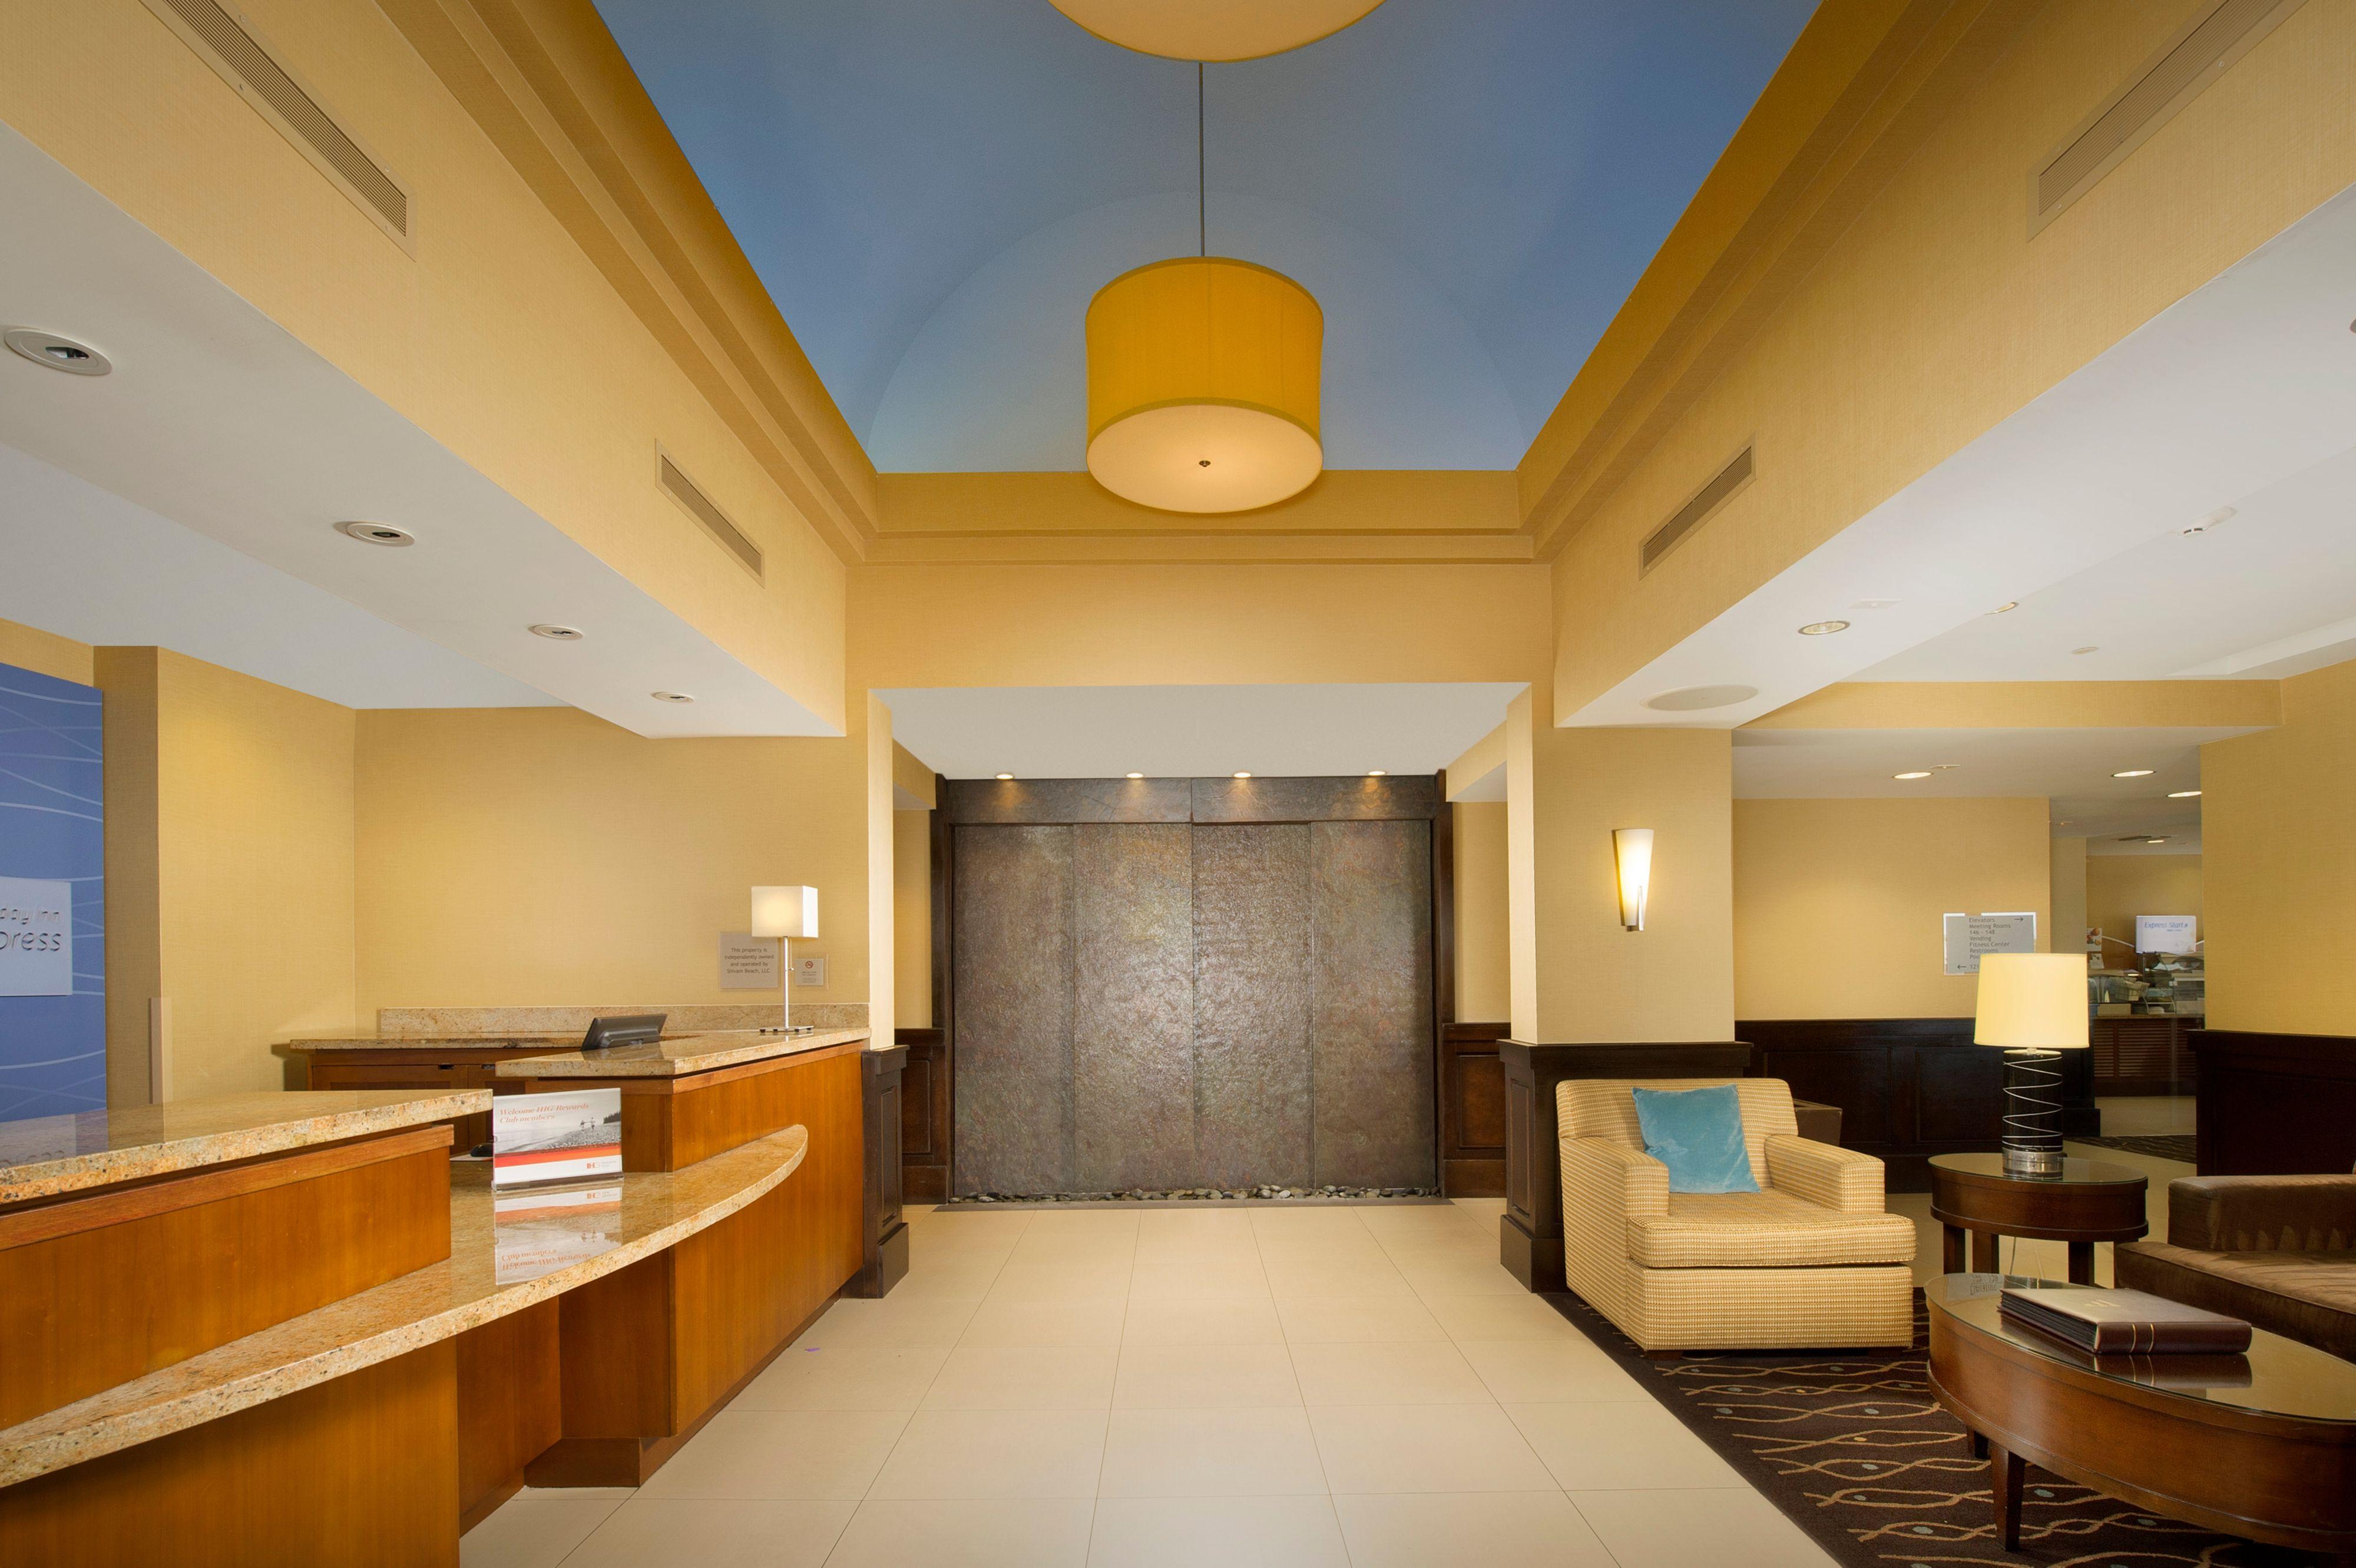 Holiday Inn Express Jacksonville Beach image 4